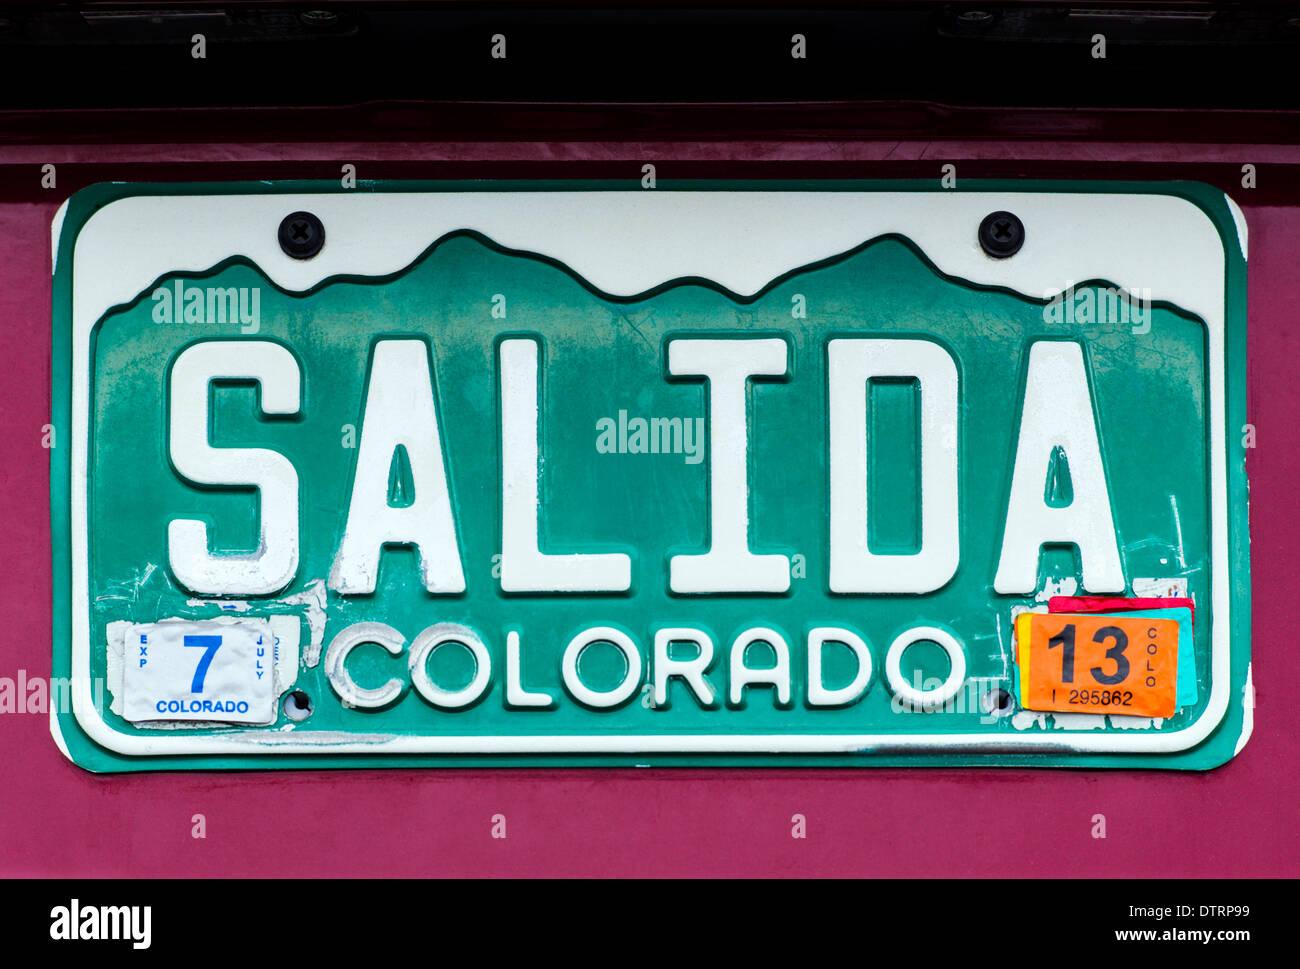 Colorado state automobile license plate reads 'Salida' in Salida, Colorado, USA - Stock Image